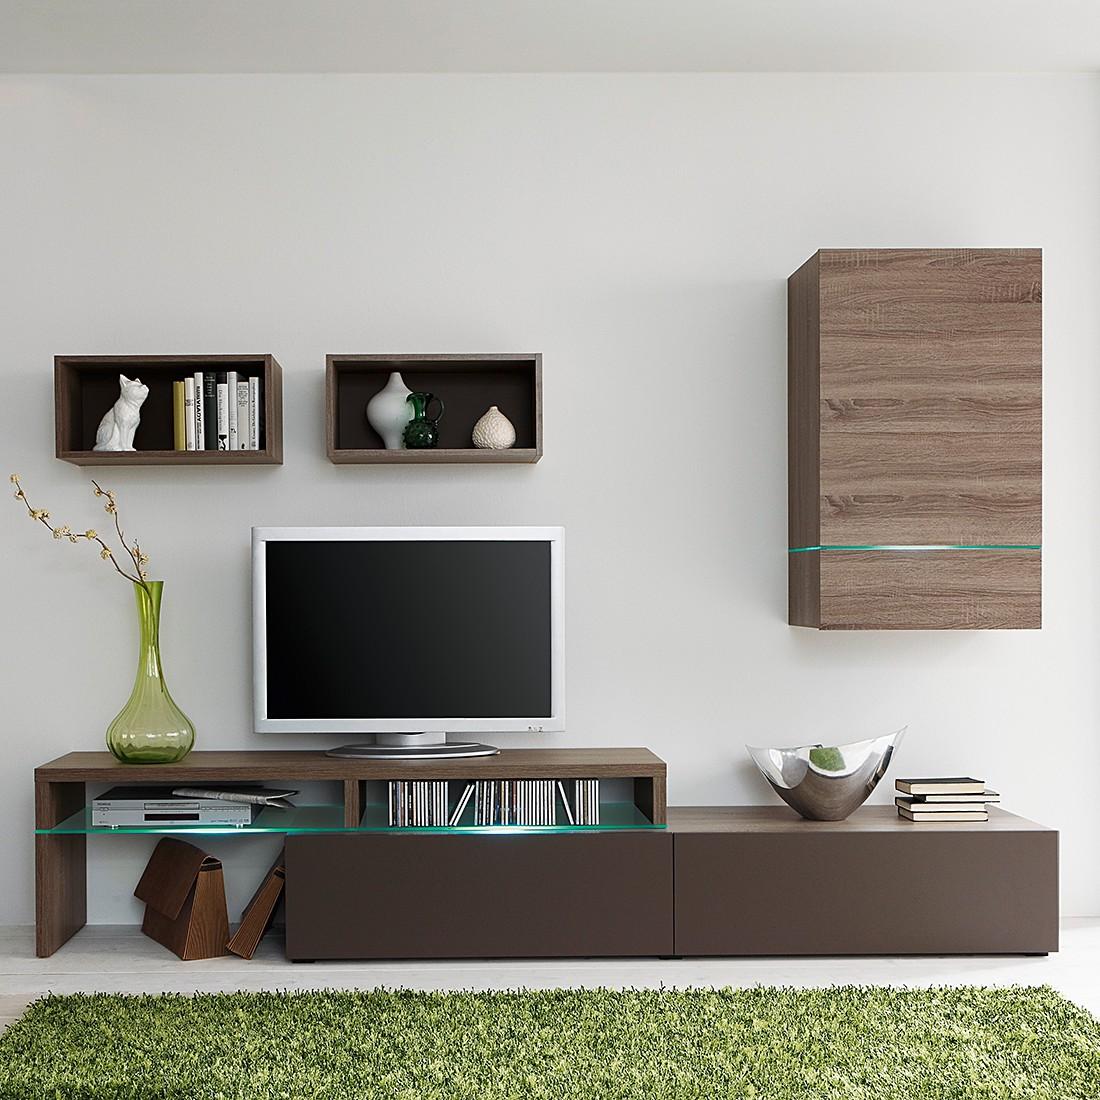 wohnwand colourart 4 teilig eiche sonoma tr ffel dekor lava ohne beleuchtung cs schmal. Black Bedroom Furniture Sets. Home Design Ideas